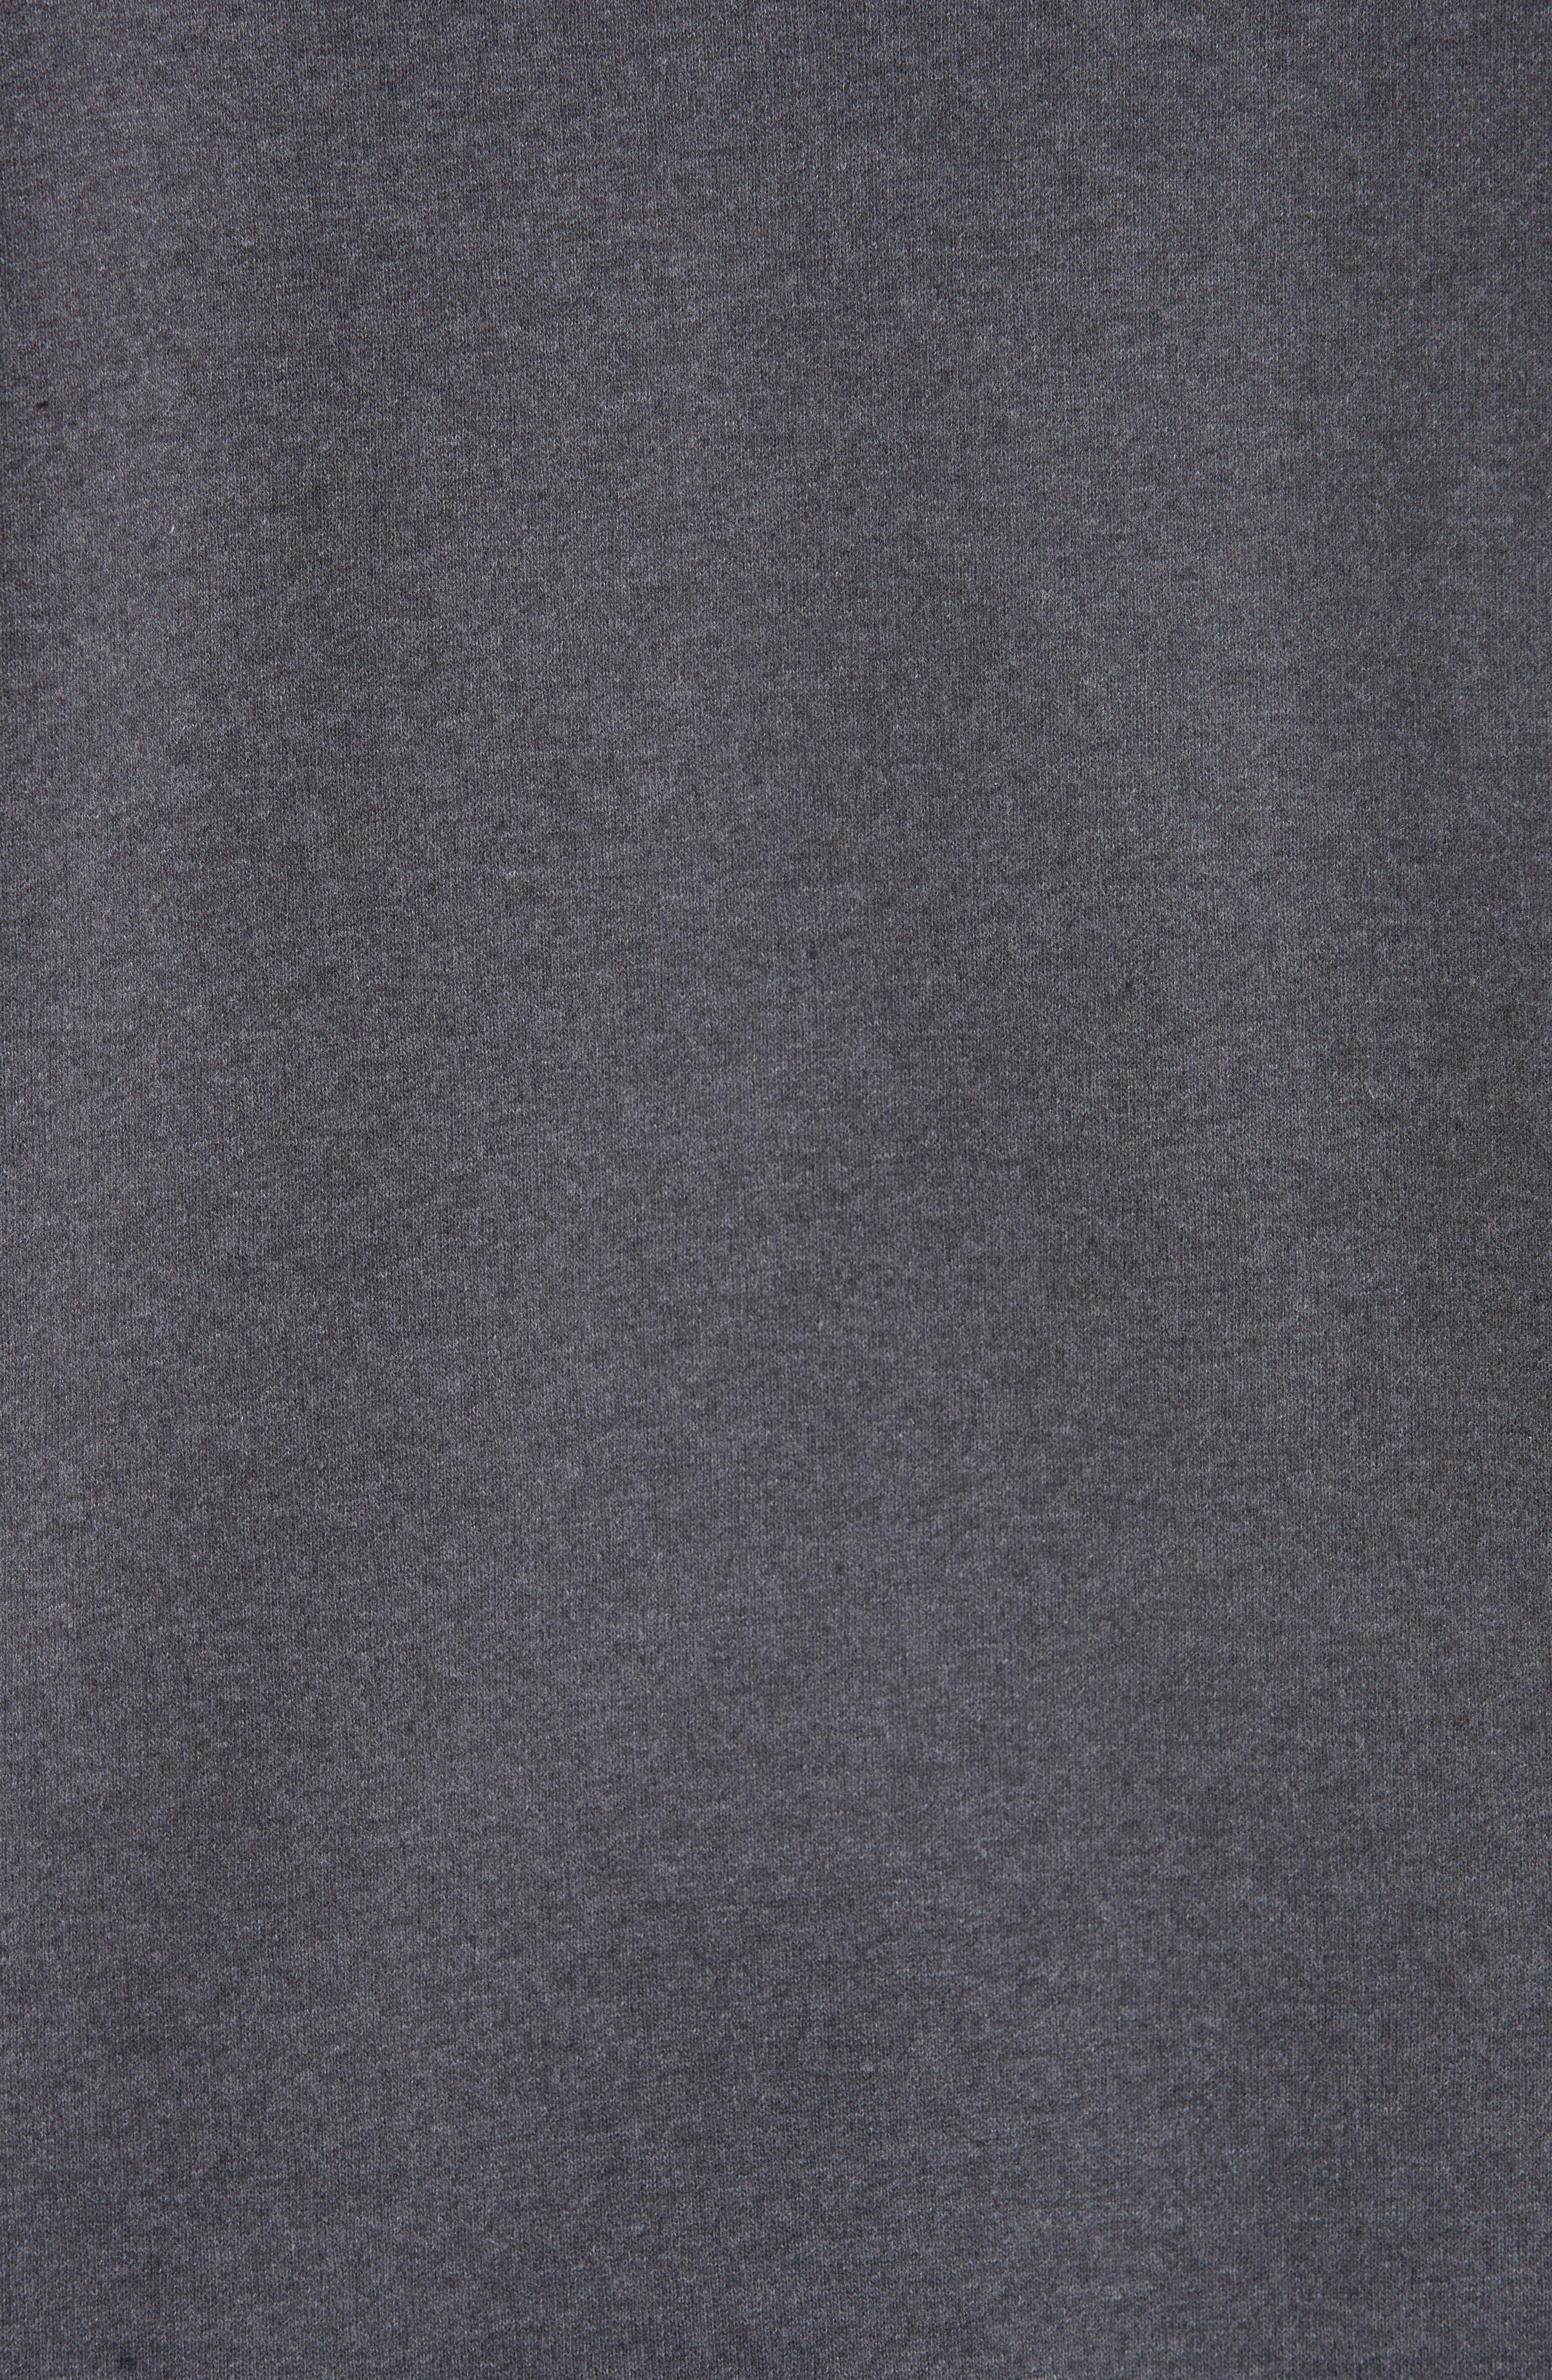 Roman Crewneck Sweatshirt,                             Alternate thumbnail 5, color,                             ANTHRACITE LAD